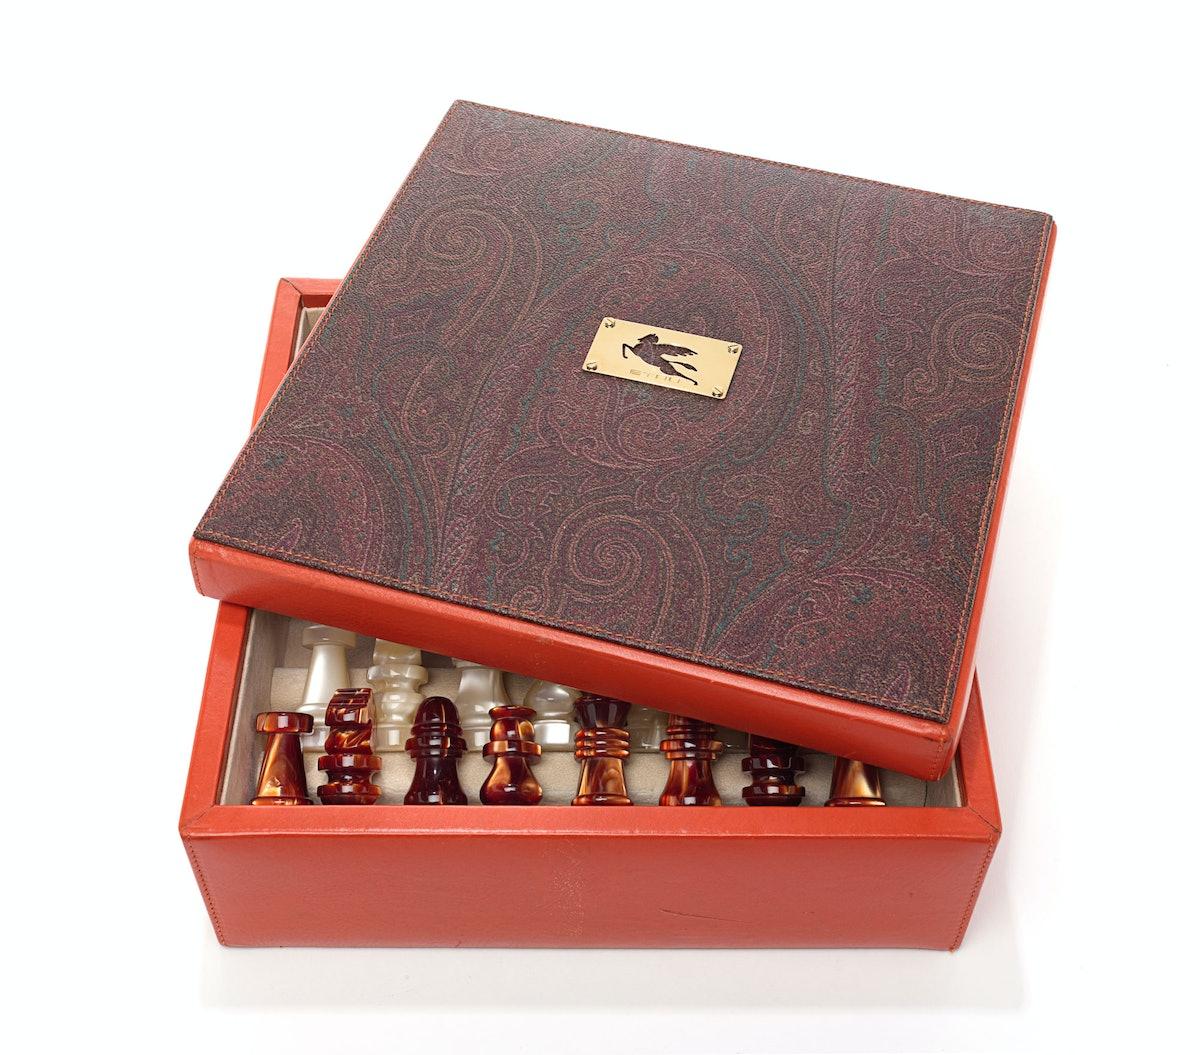 Etro chess set, $2,506, [saks.com](http://rstyle.me/n/drh8d3w3n).